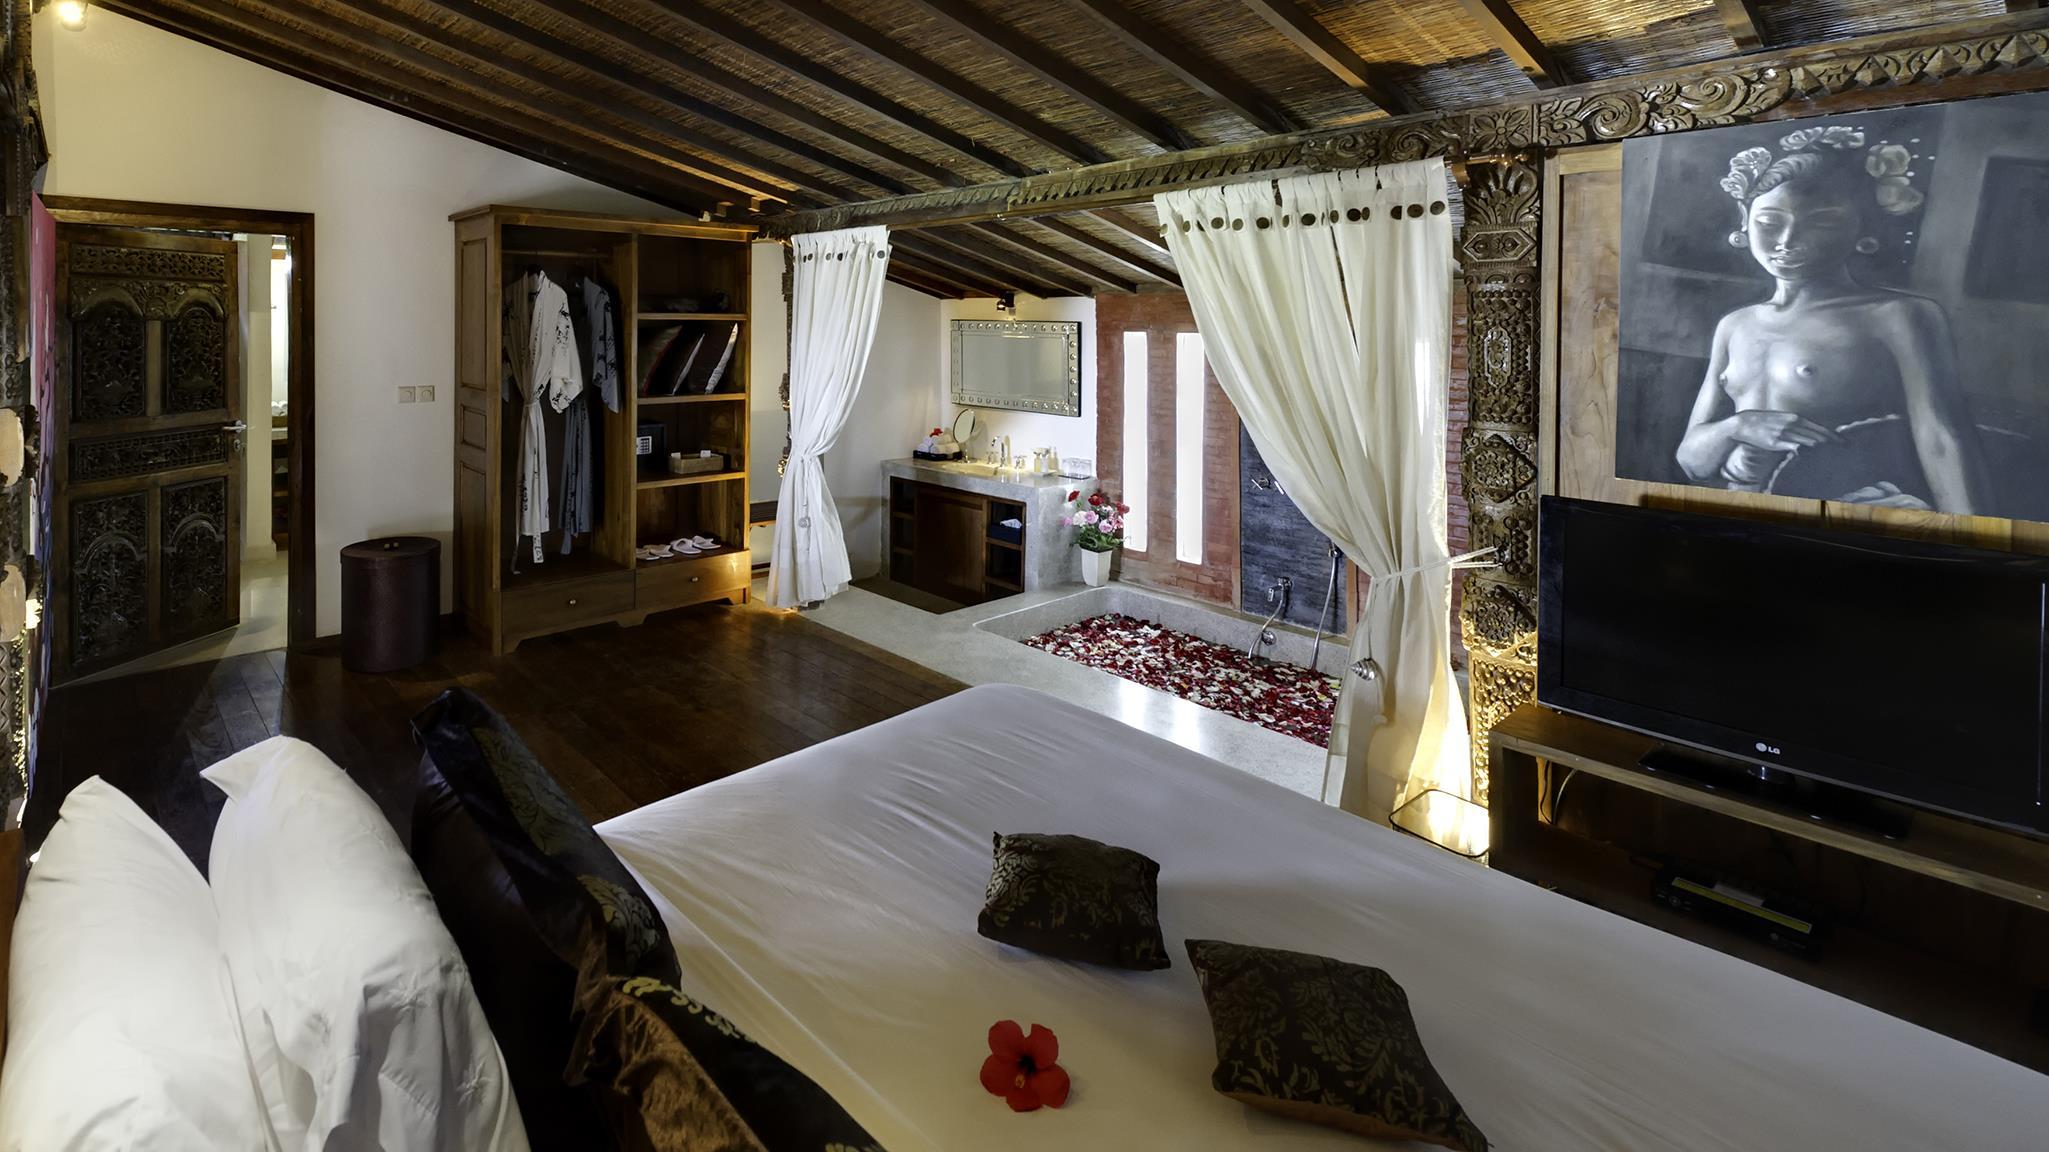 Bedroom and En-Suite Bathroom with Bathtub - Majapahit Beach Villas - Sanur, Bali